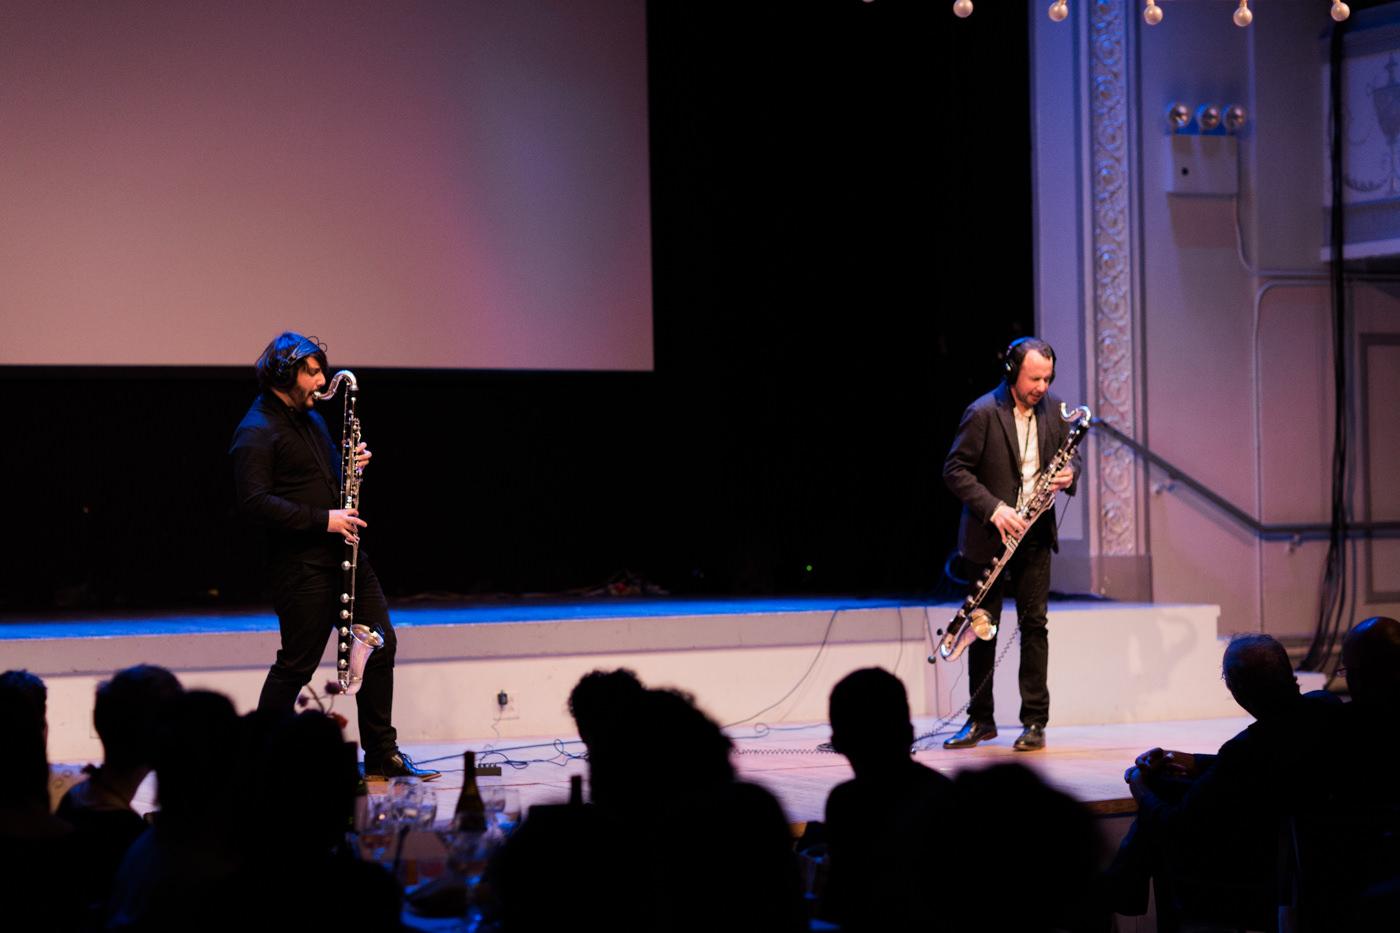 Mt Tremper Arts Gala -  NYC event photographer Kamp Weddings-21.jpg